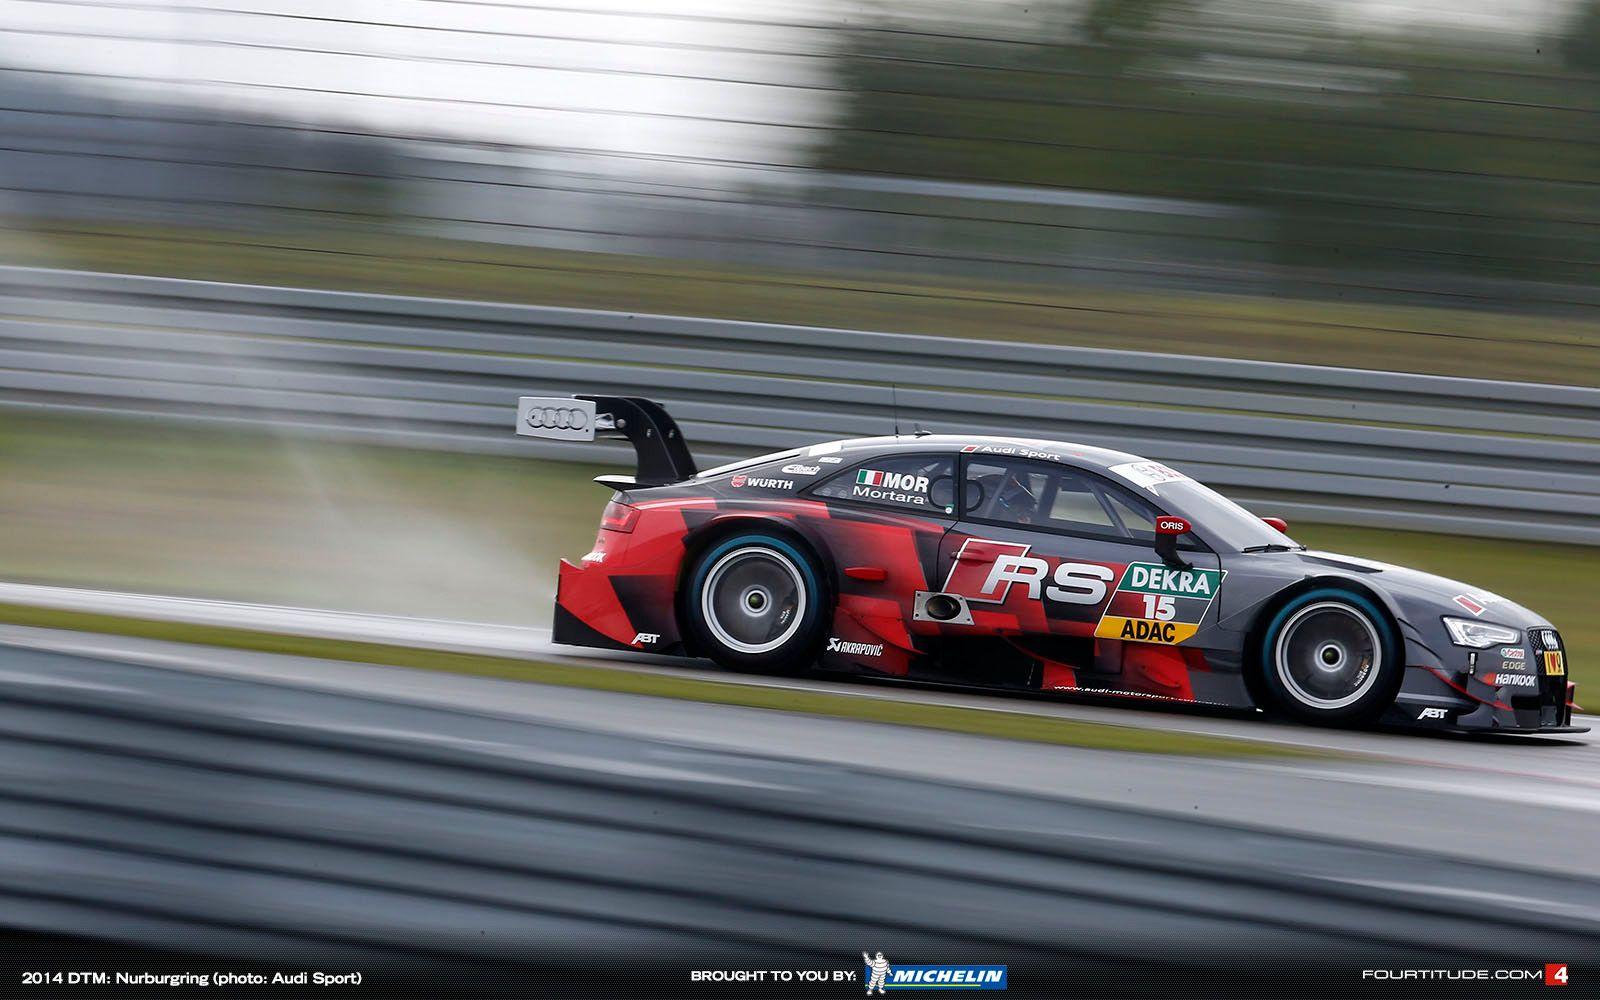 DTM: Audi Banks on Strong Teamwork at Lausitz - Fourtitude.com